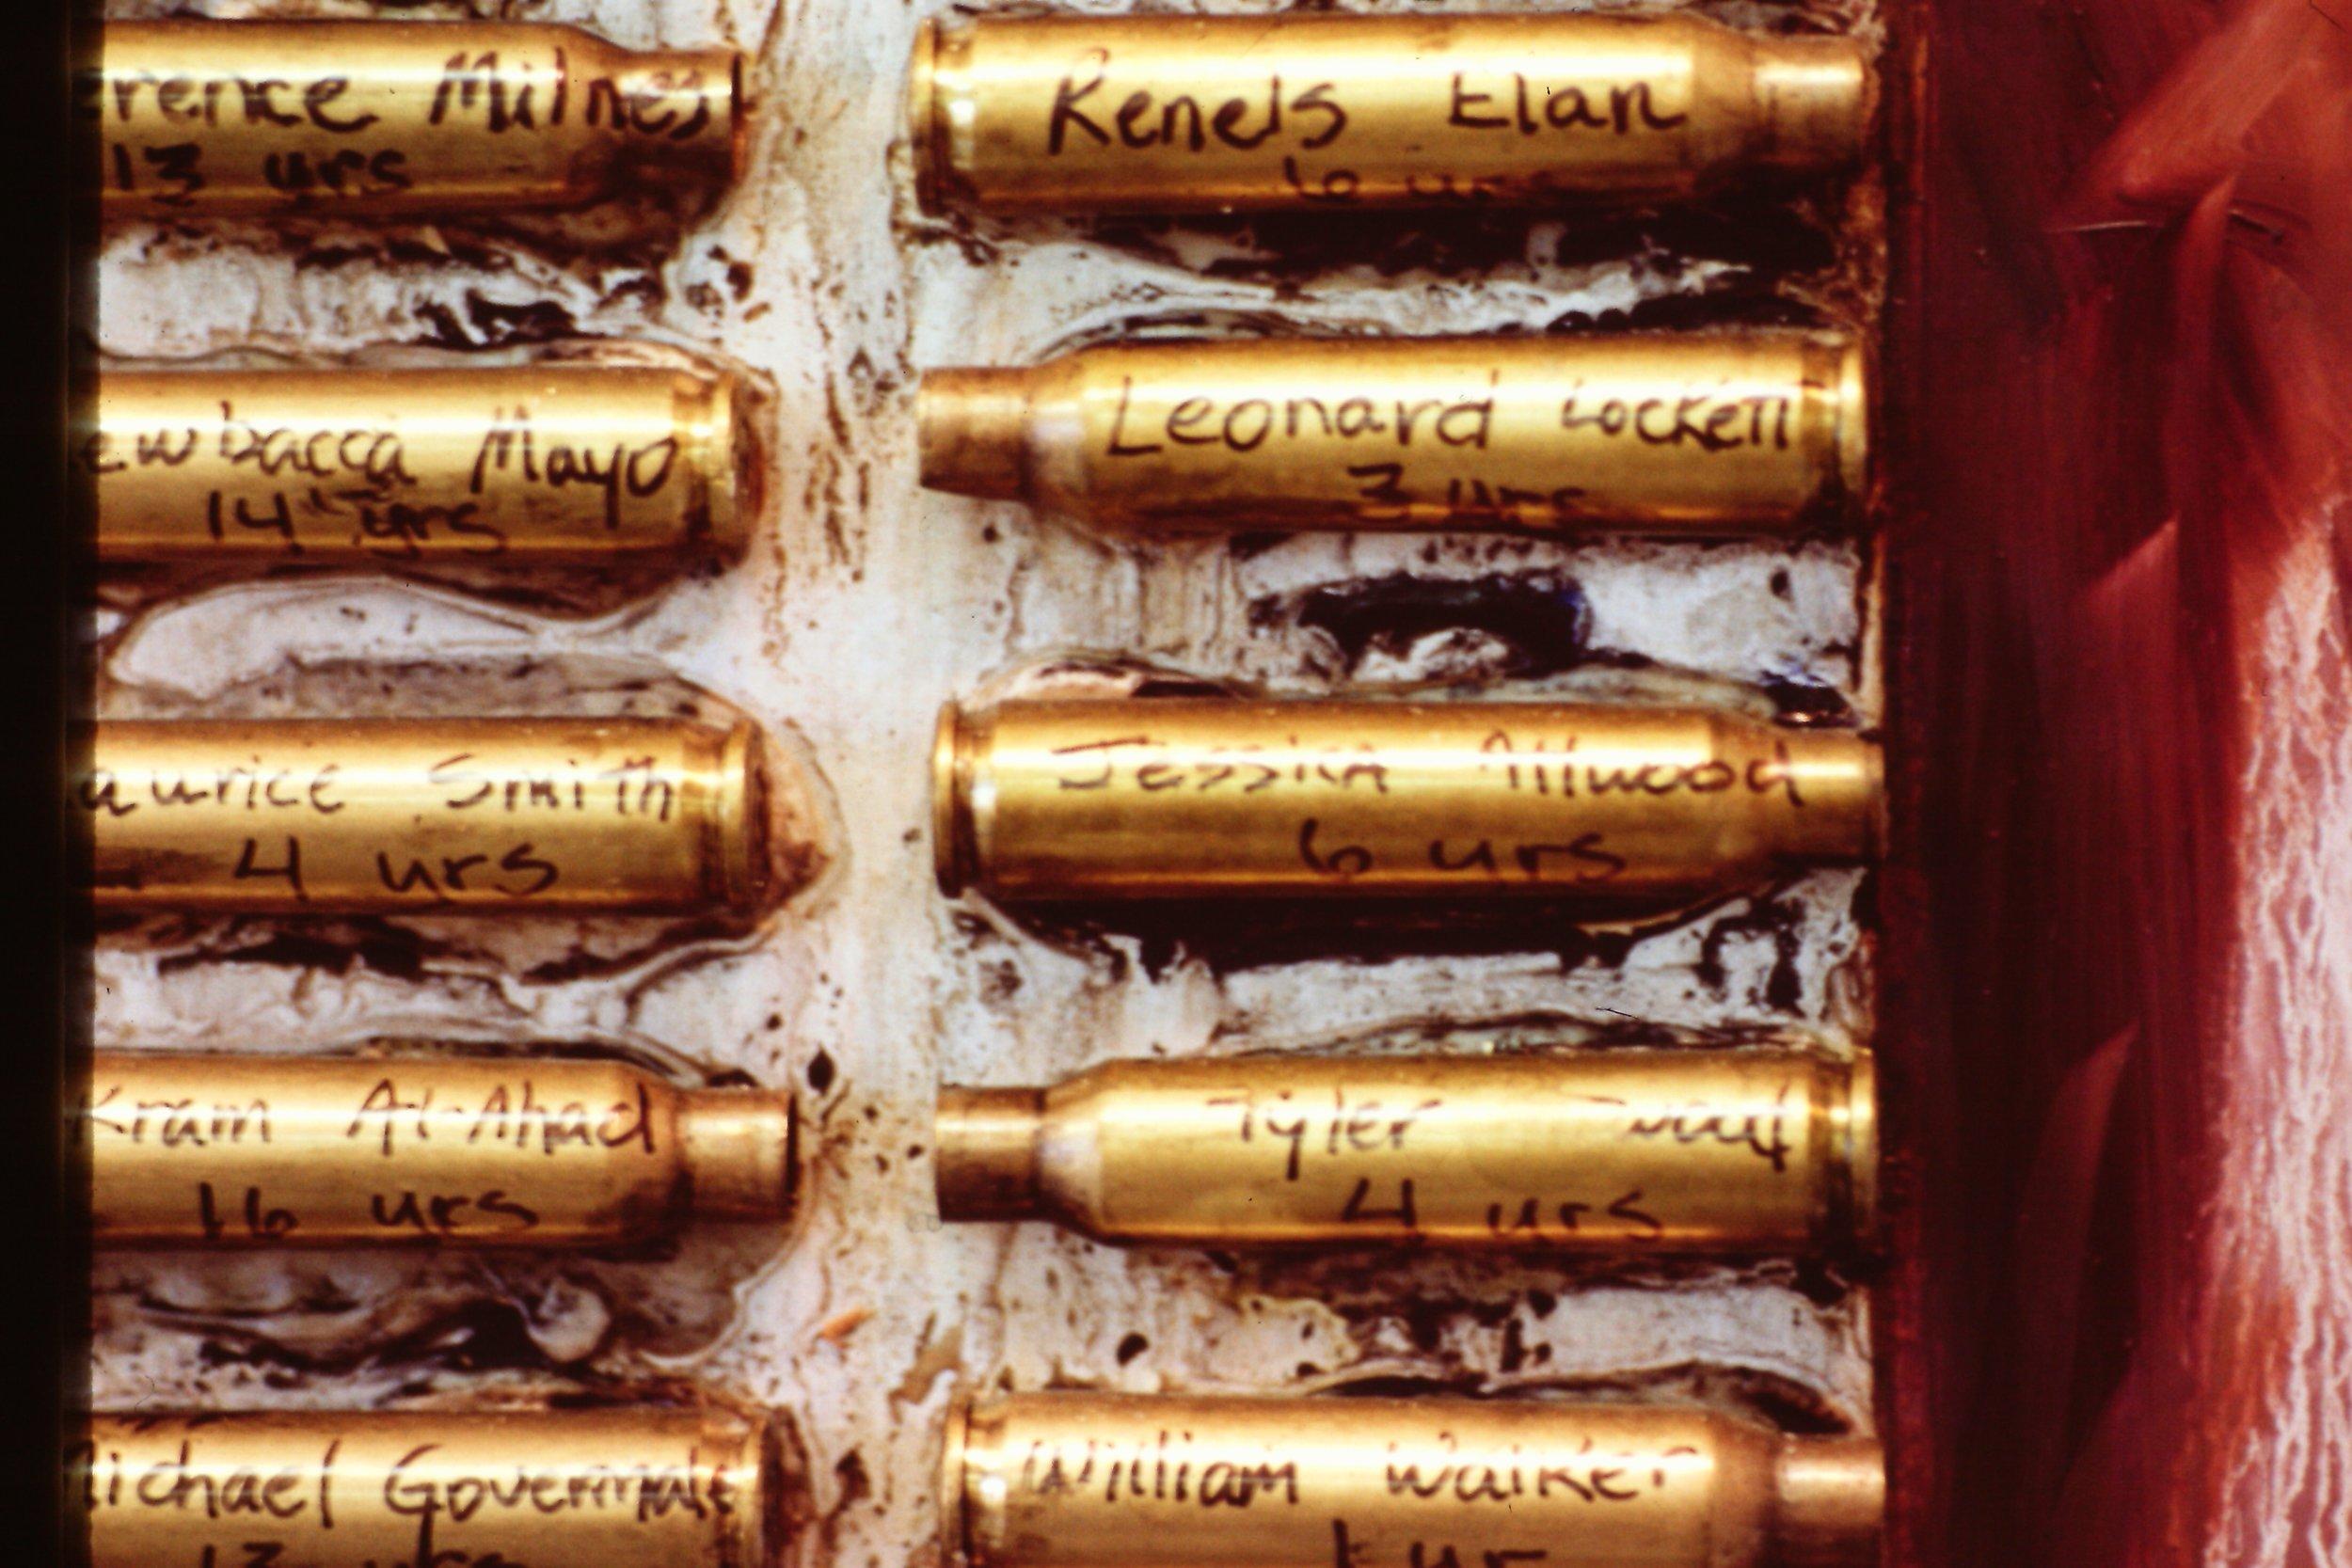 Close - up - 497 Shells - Children under 16 killed by guns